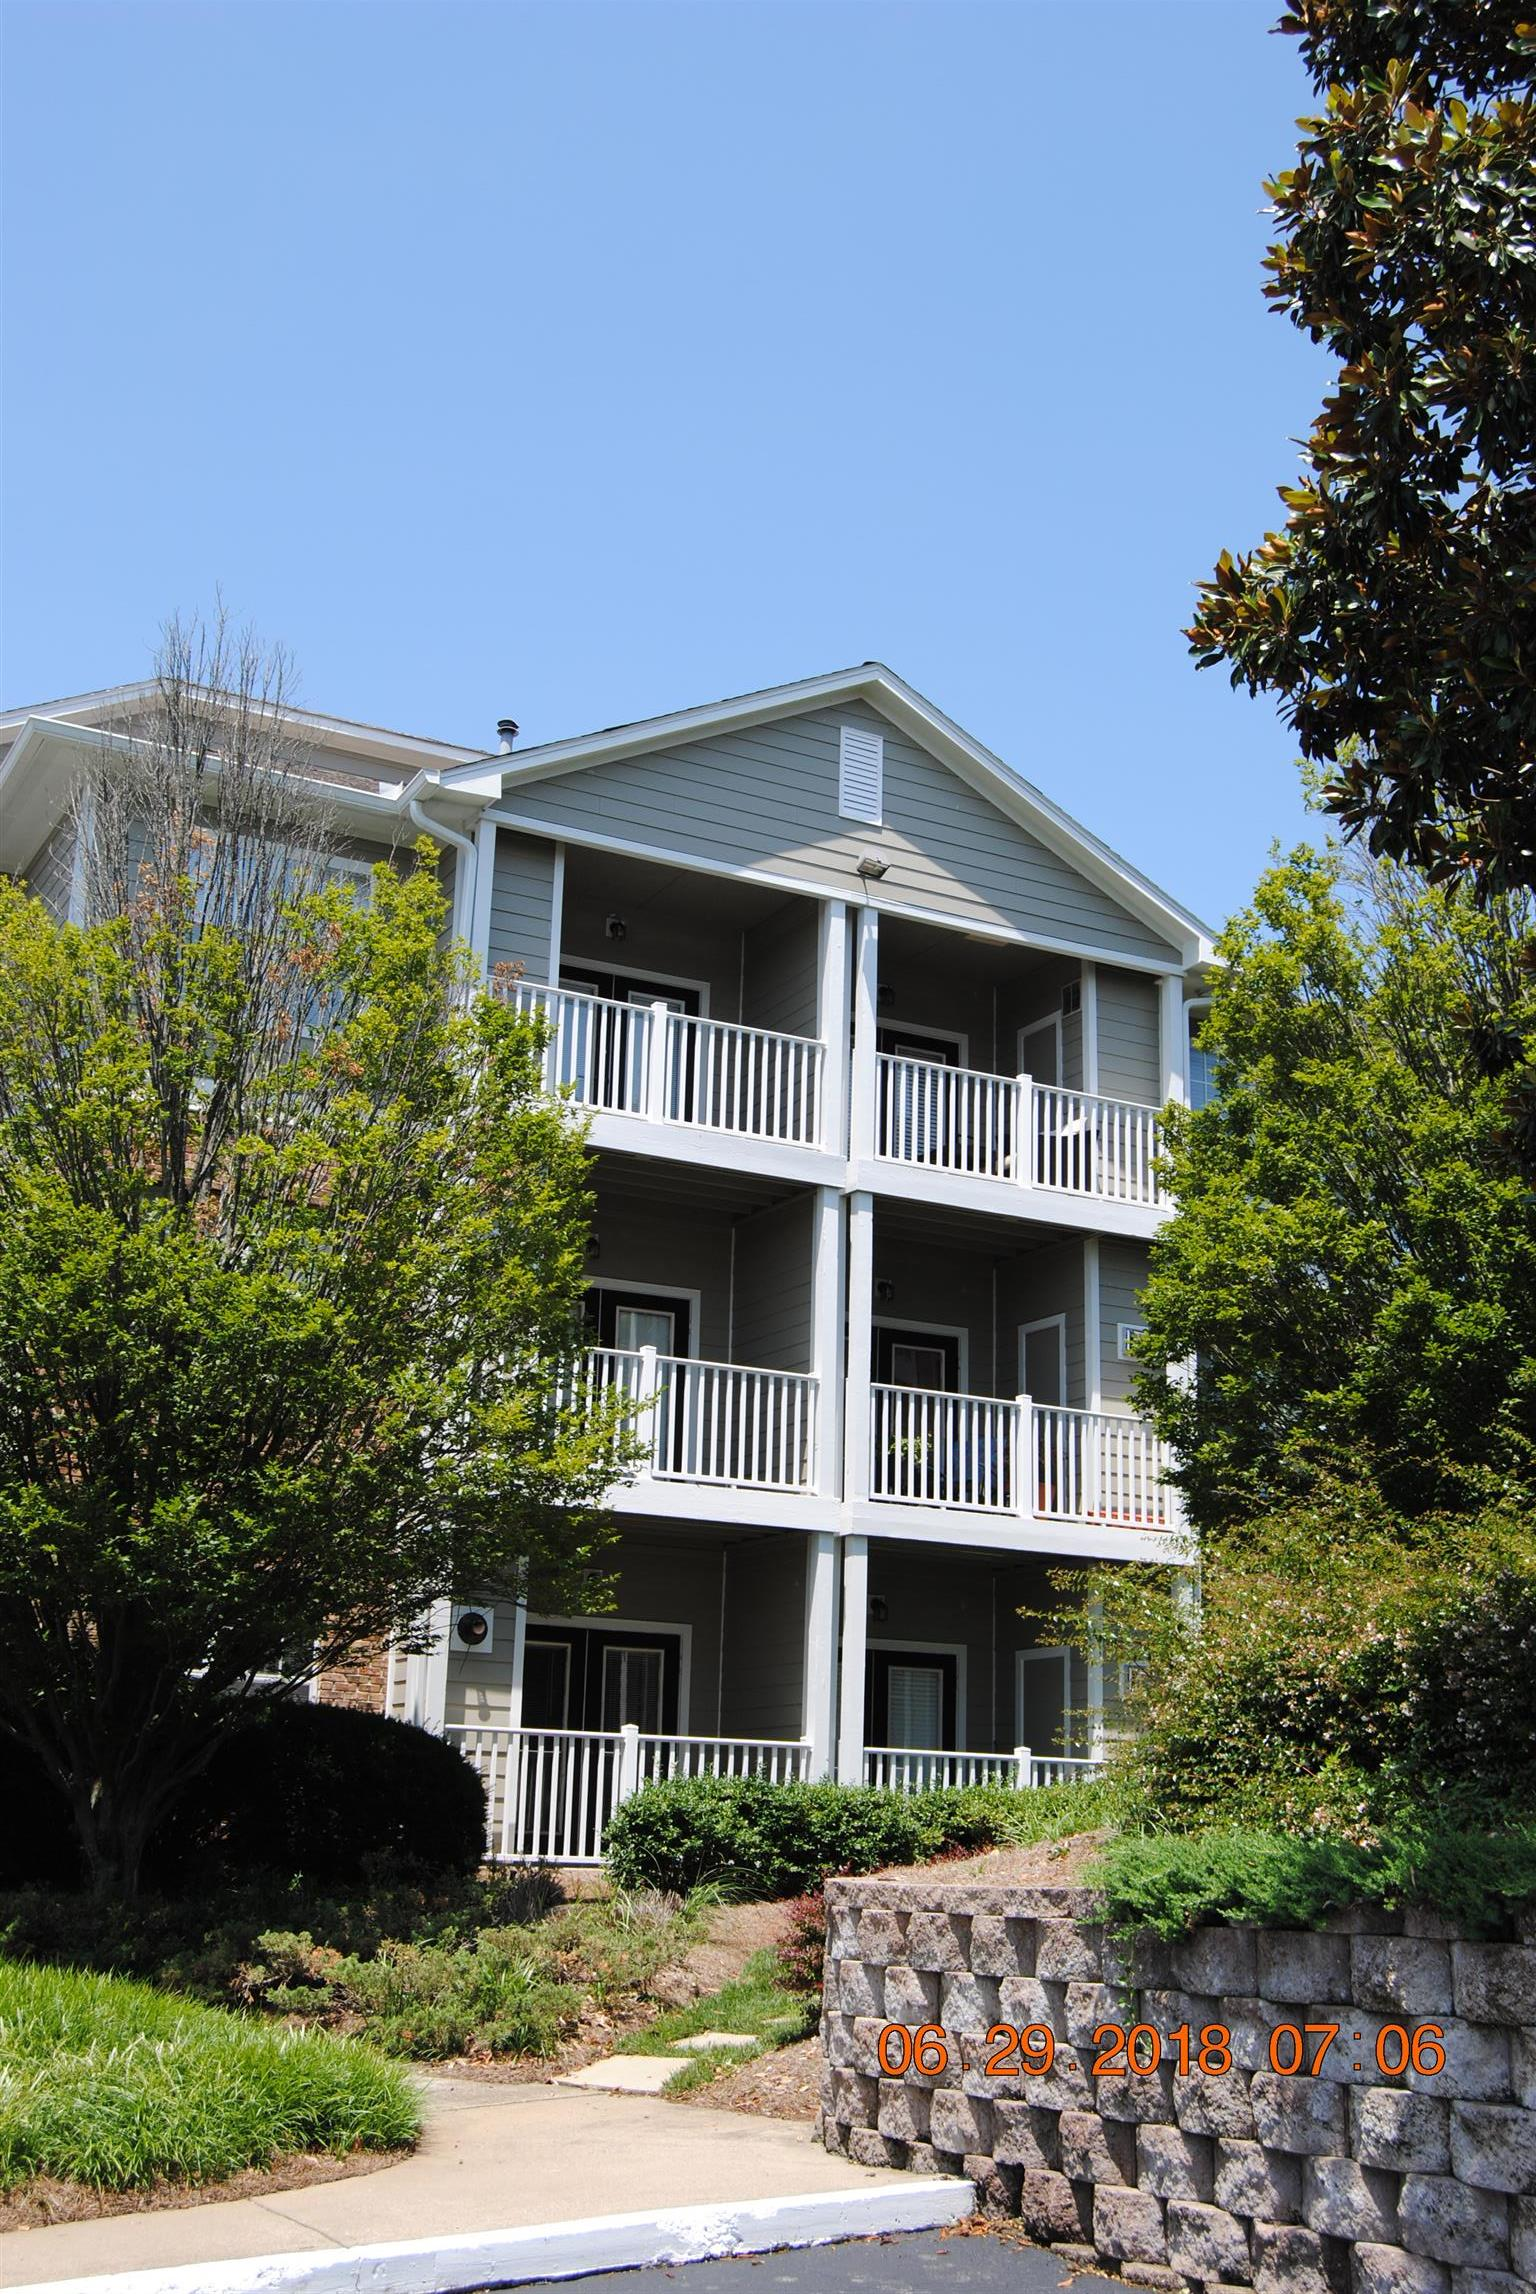 2025 Woodmont Blvd Apt 346, Nashville, TN 37215